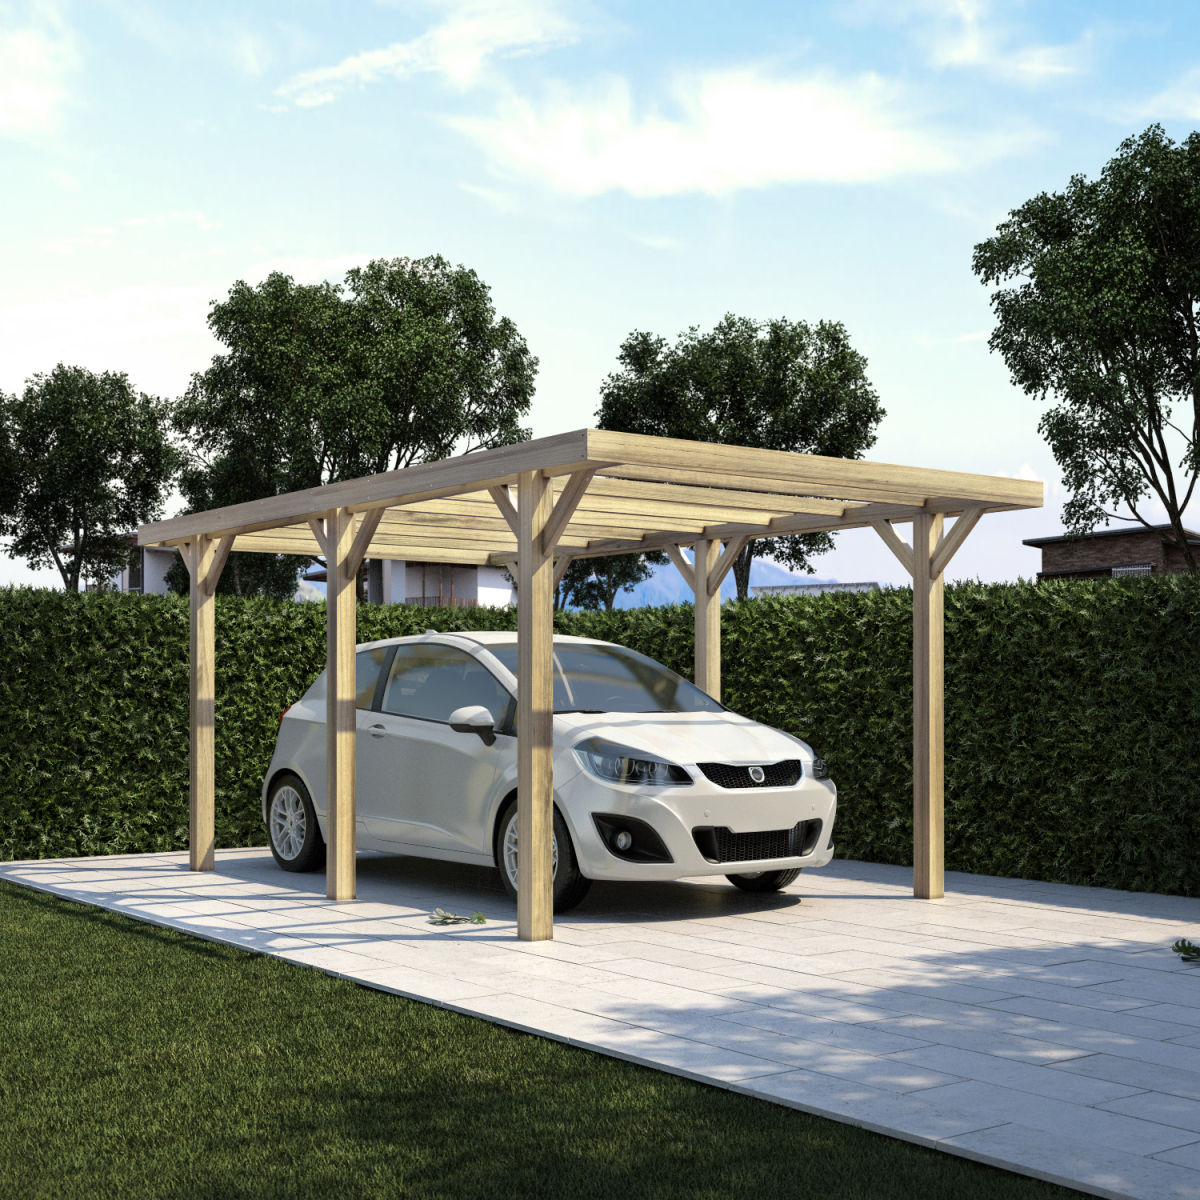 Good giardino e firenze x m with coperture mobili per auto for Telo ombreggiante leroy merlin